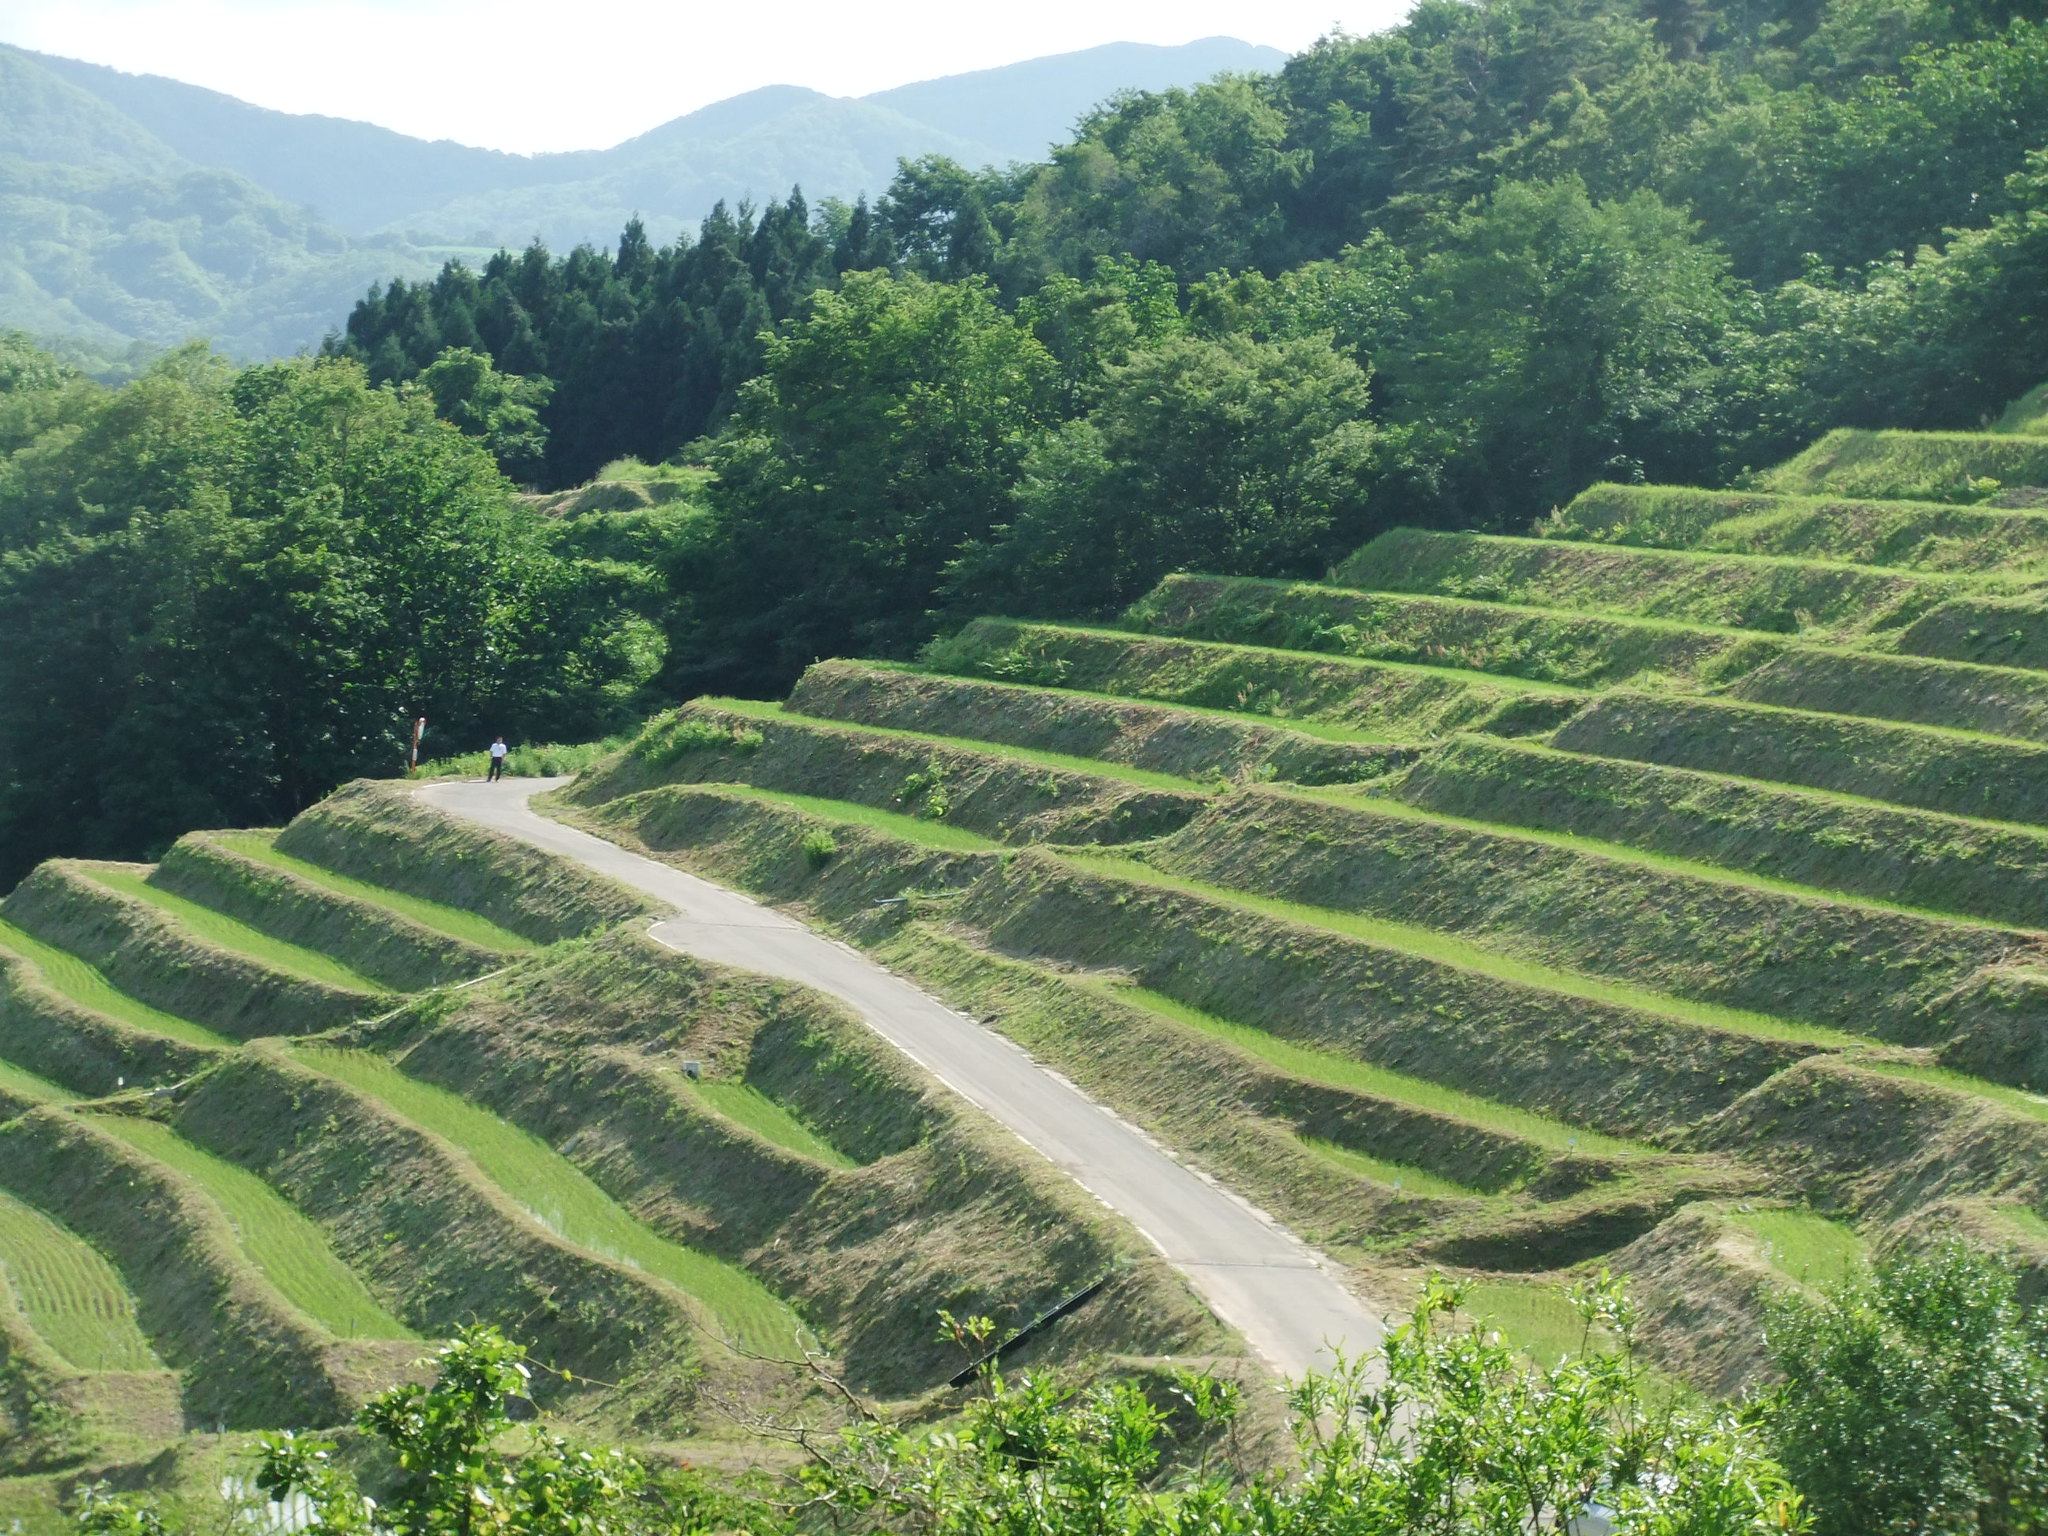 Terraced satoyama landscape, Sado, Japan